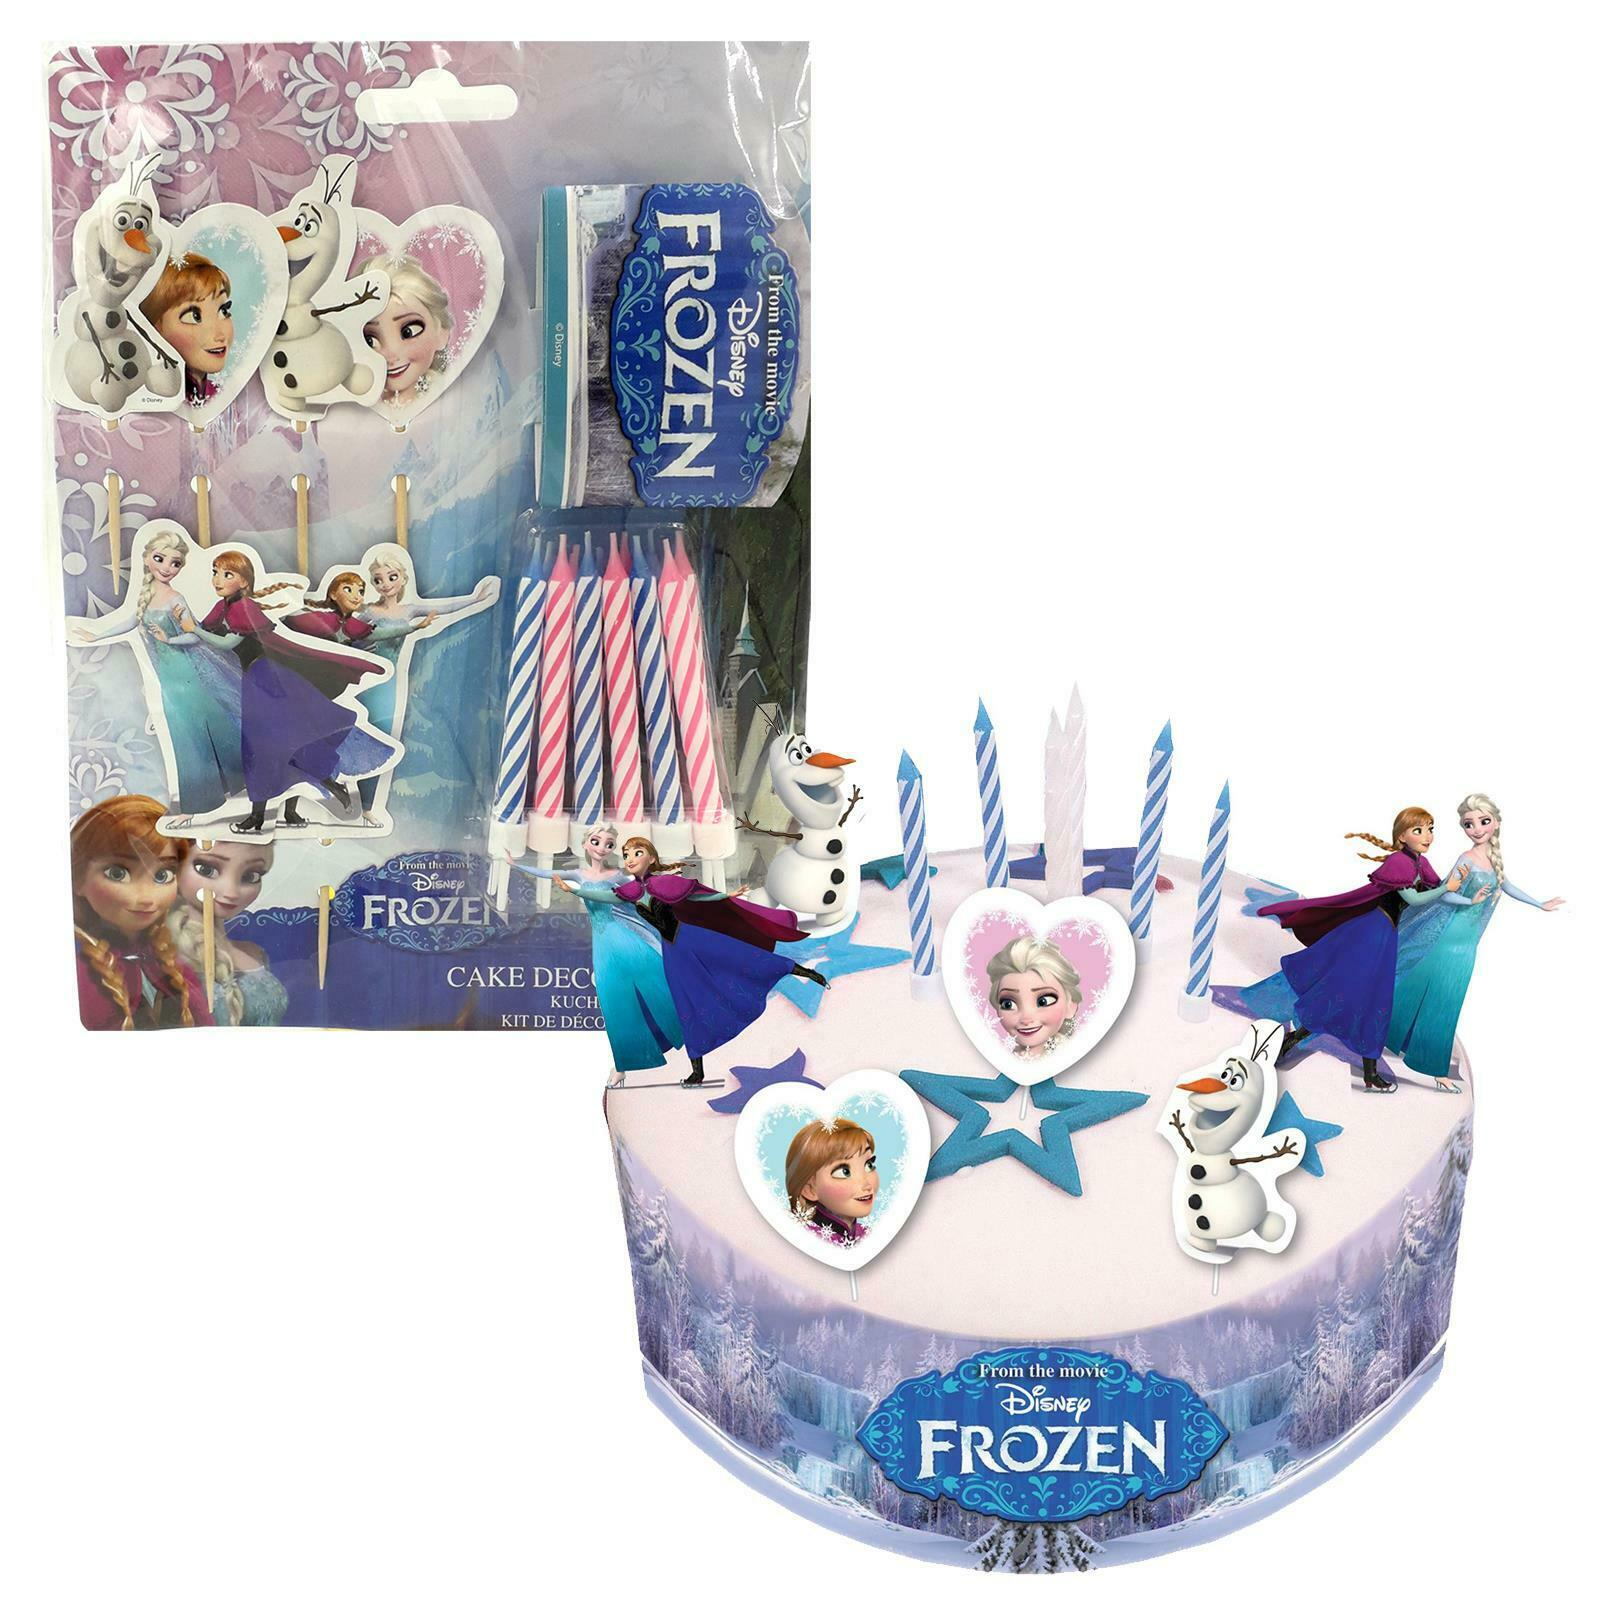 Amazing Official Disneys Frozen Birthday Cake Decorating Kit Candles Elsa Funny Birthday Cards Online Fluifree Goldxyz